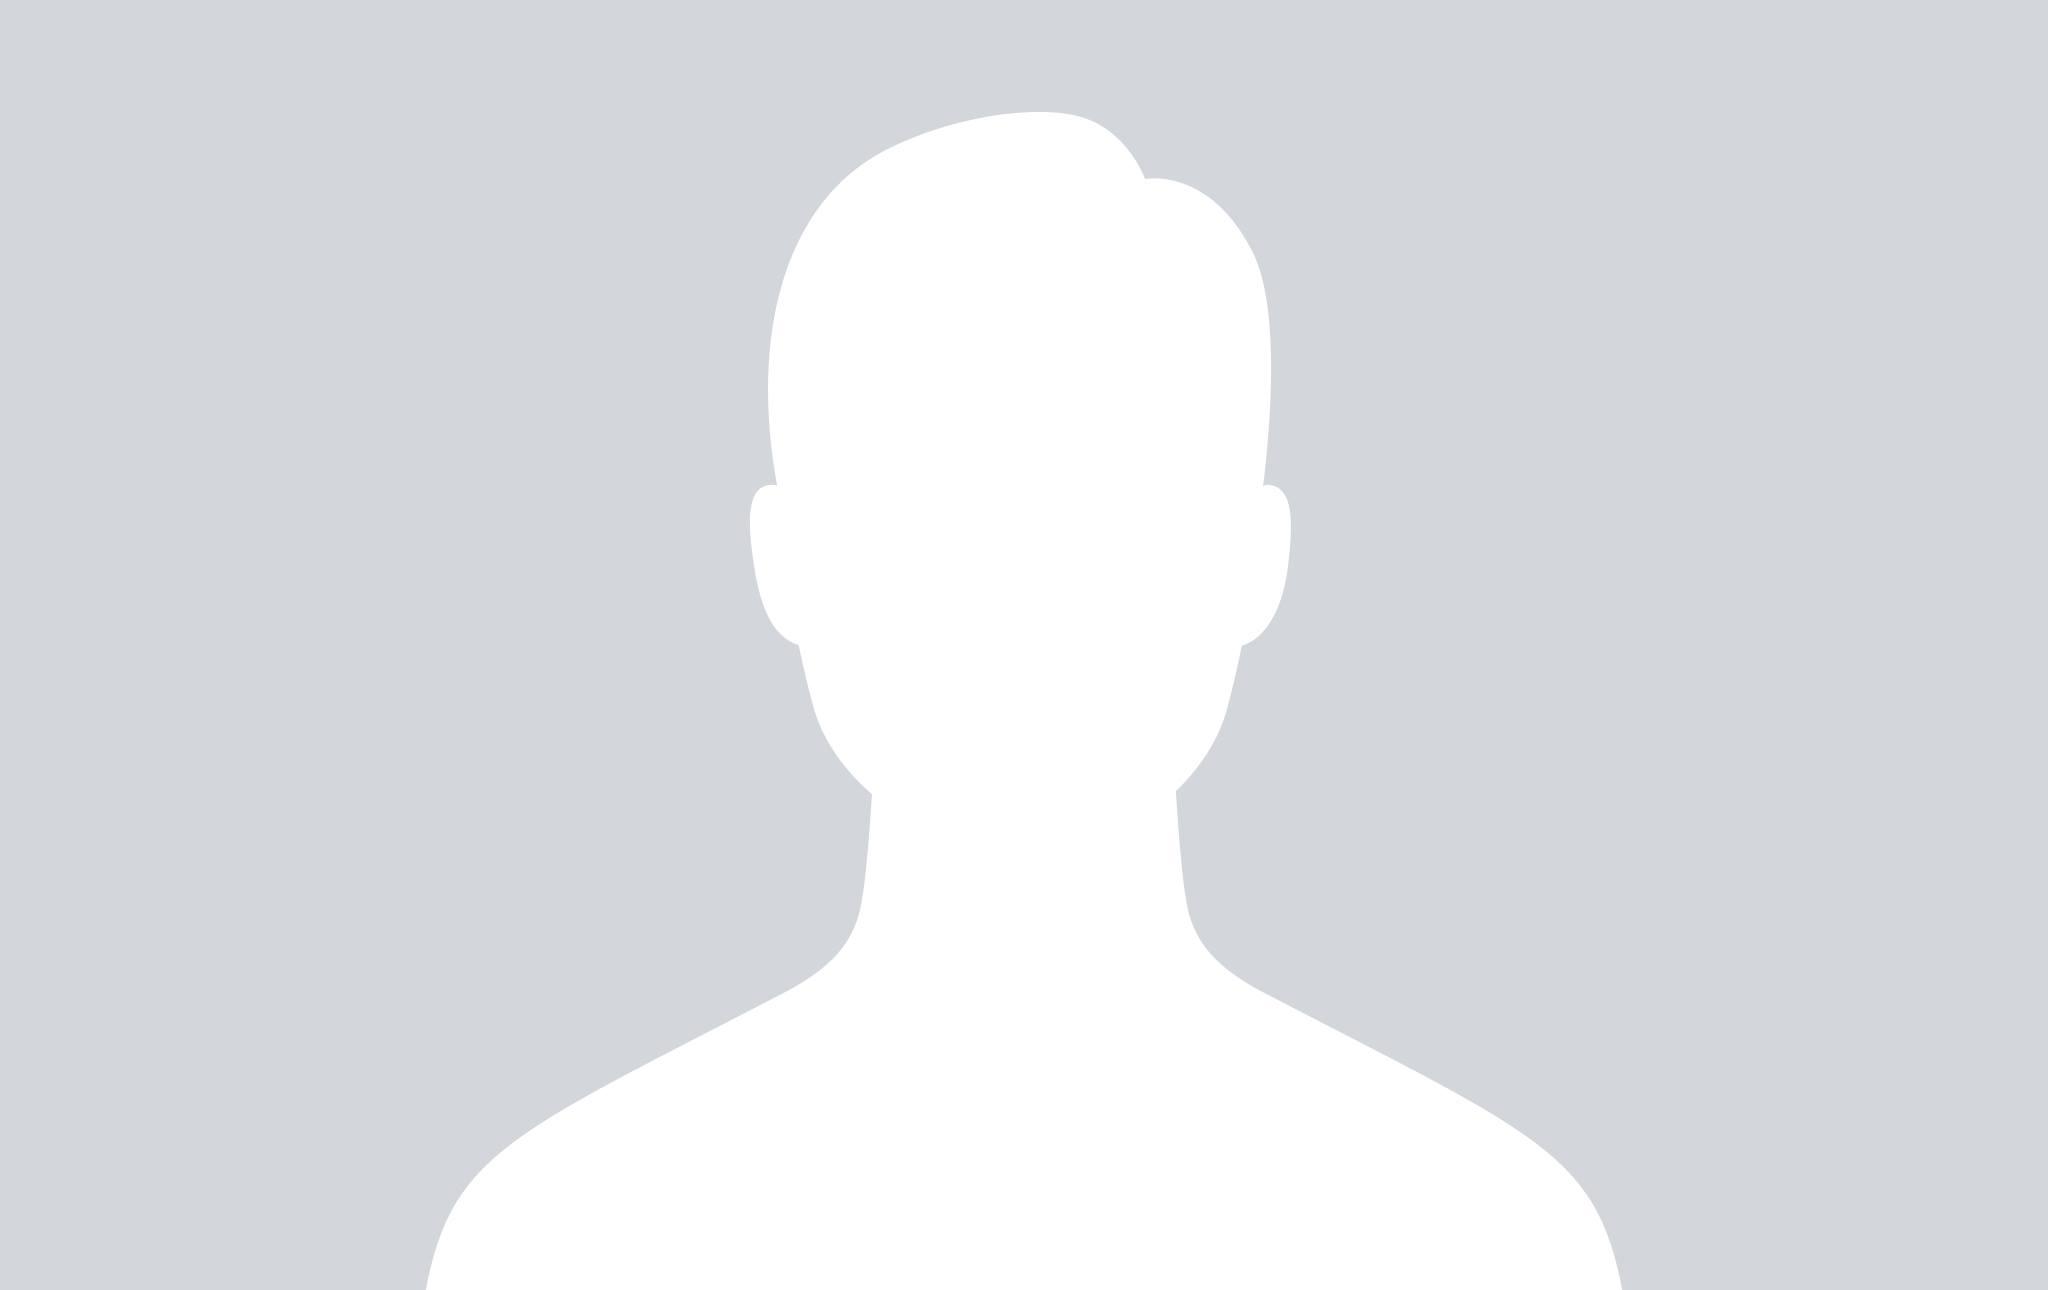 free online dating & chat in glen cove Next story free online dating in sado previous story best dating sites innisfil dating in glen cove in your 30s speed dating schwetzingen this weekend.